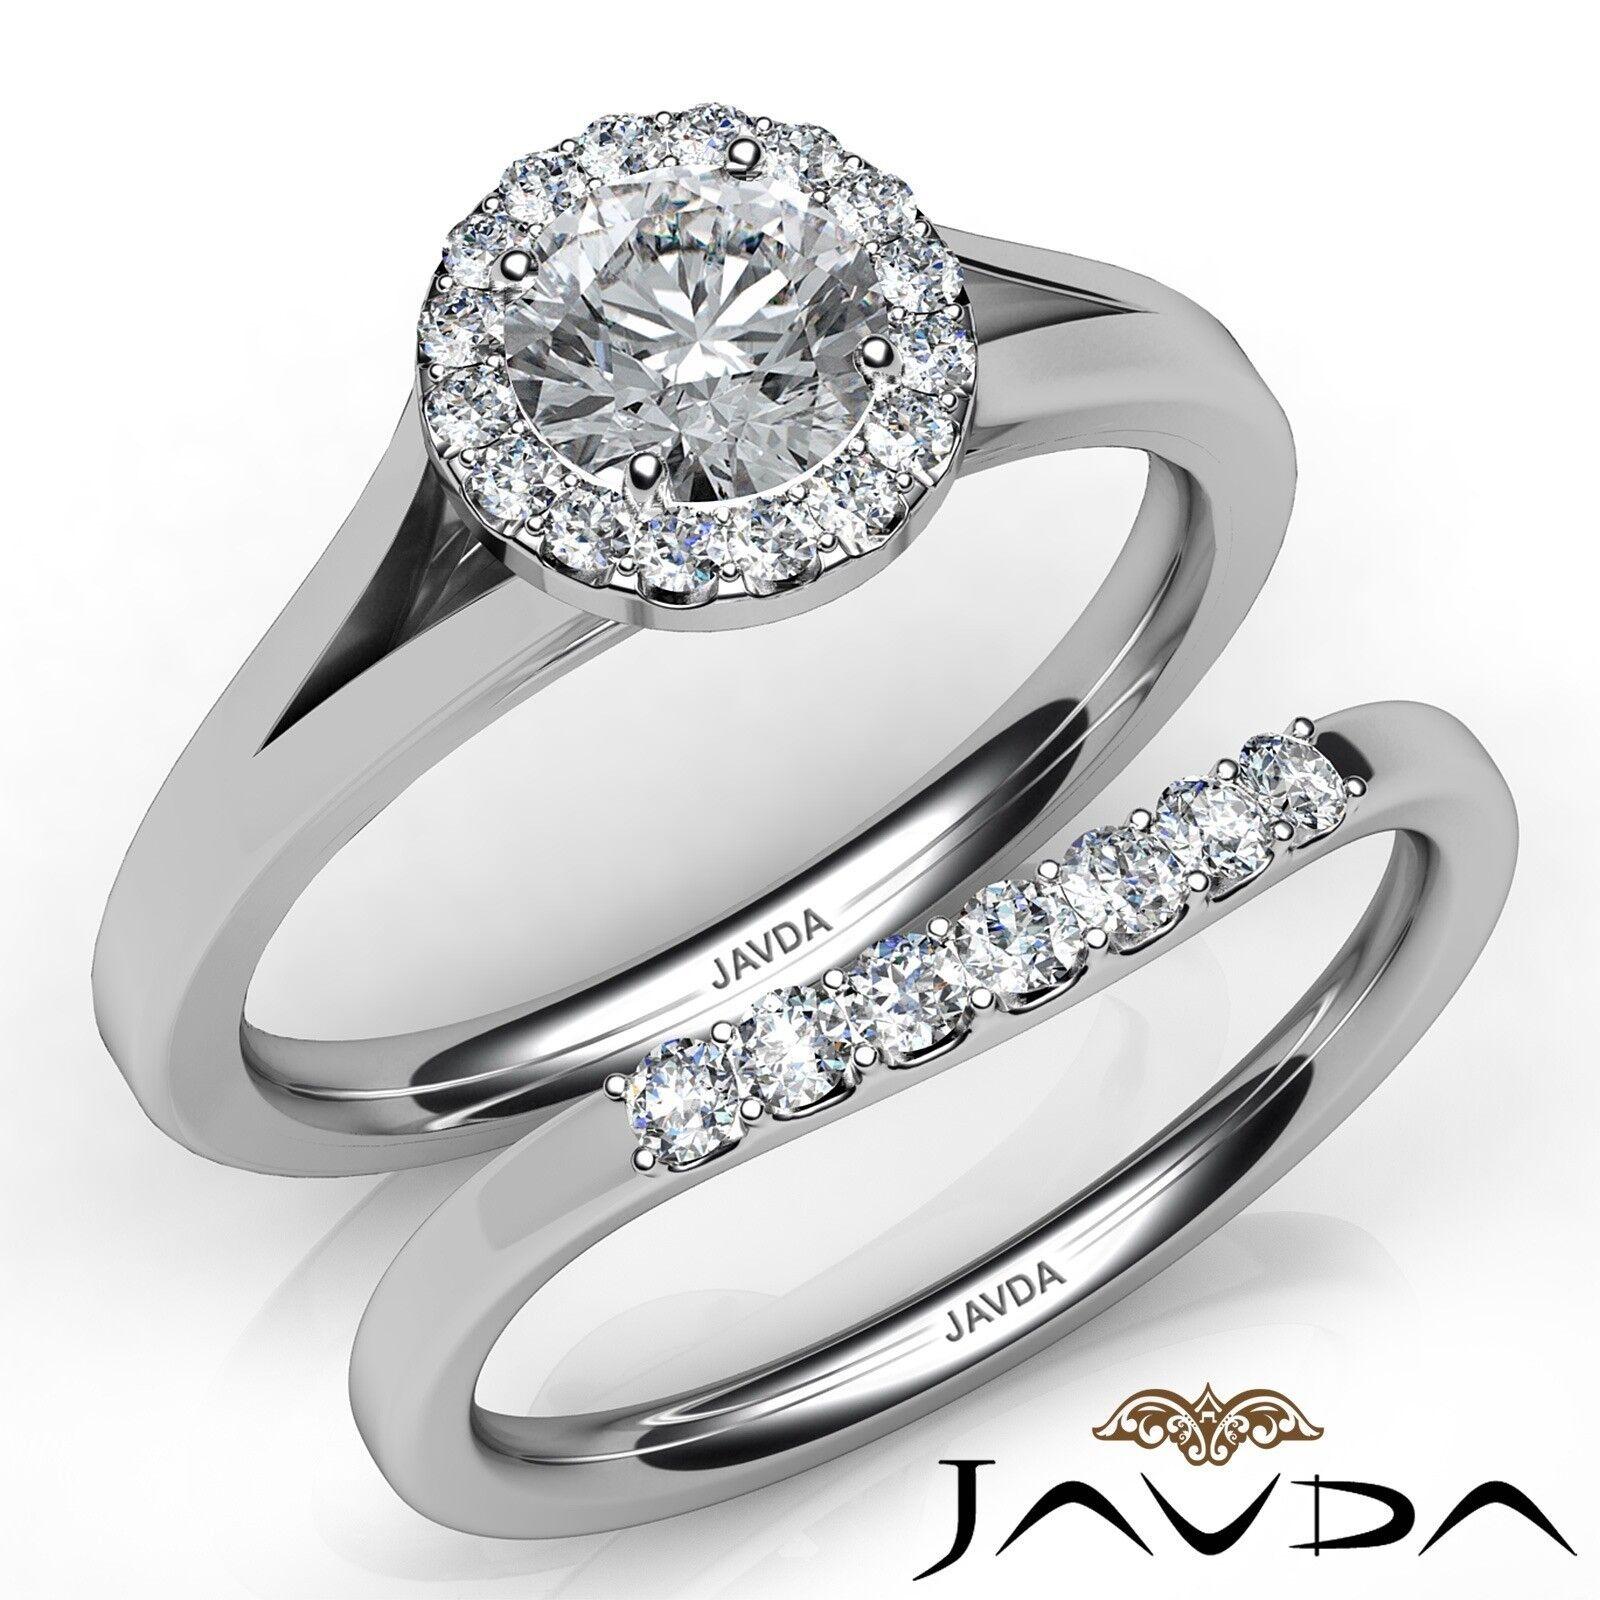 1.02ctw Classic Bridal Halo Pave Round Diamond Engagement Ring GIA E-VS2 W Gold